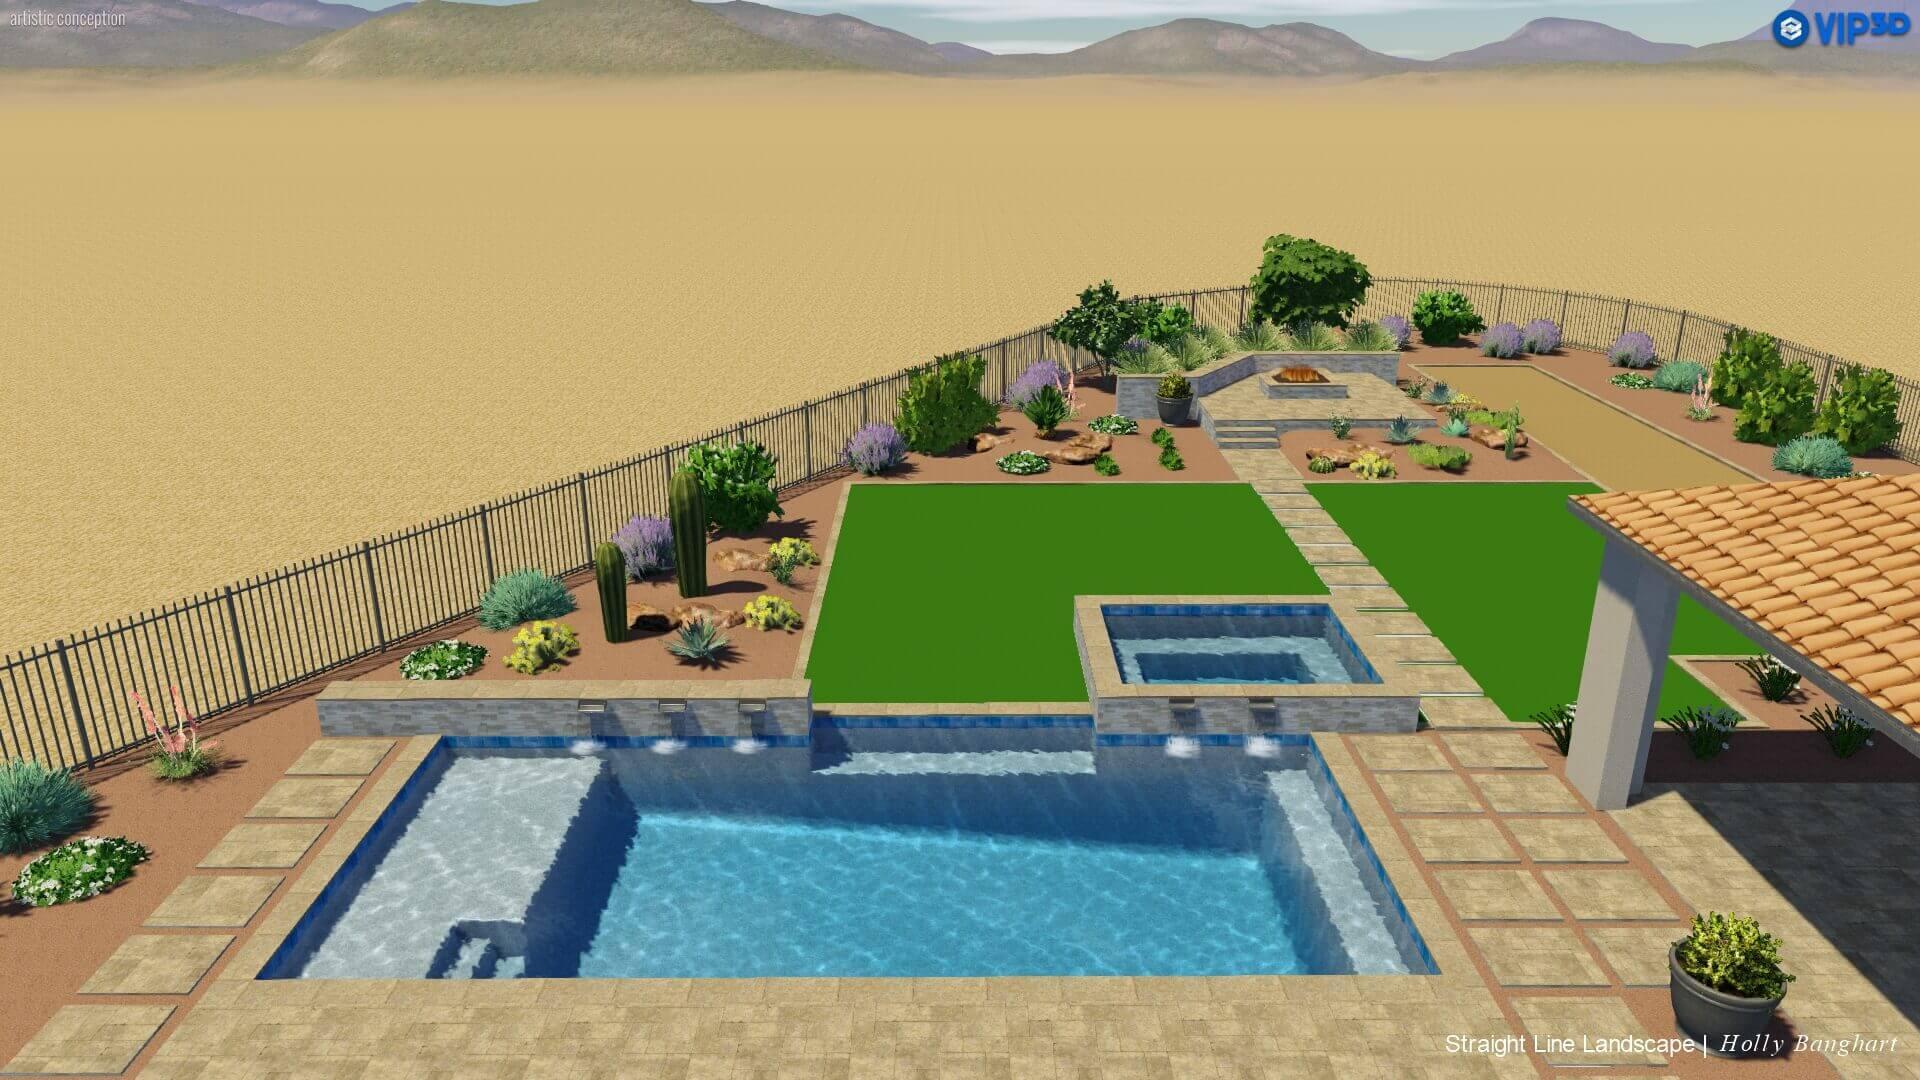 outdoor spa and turf arizona